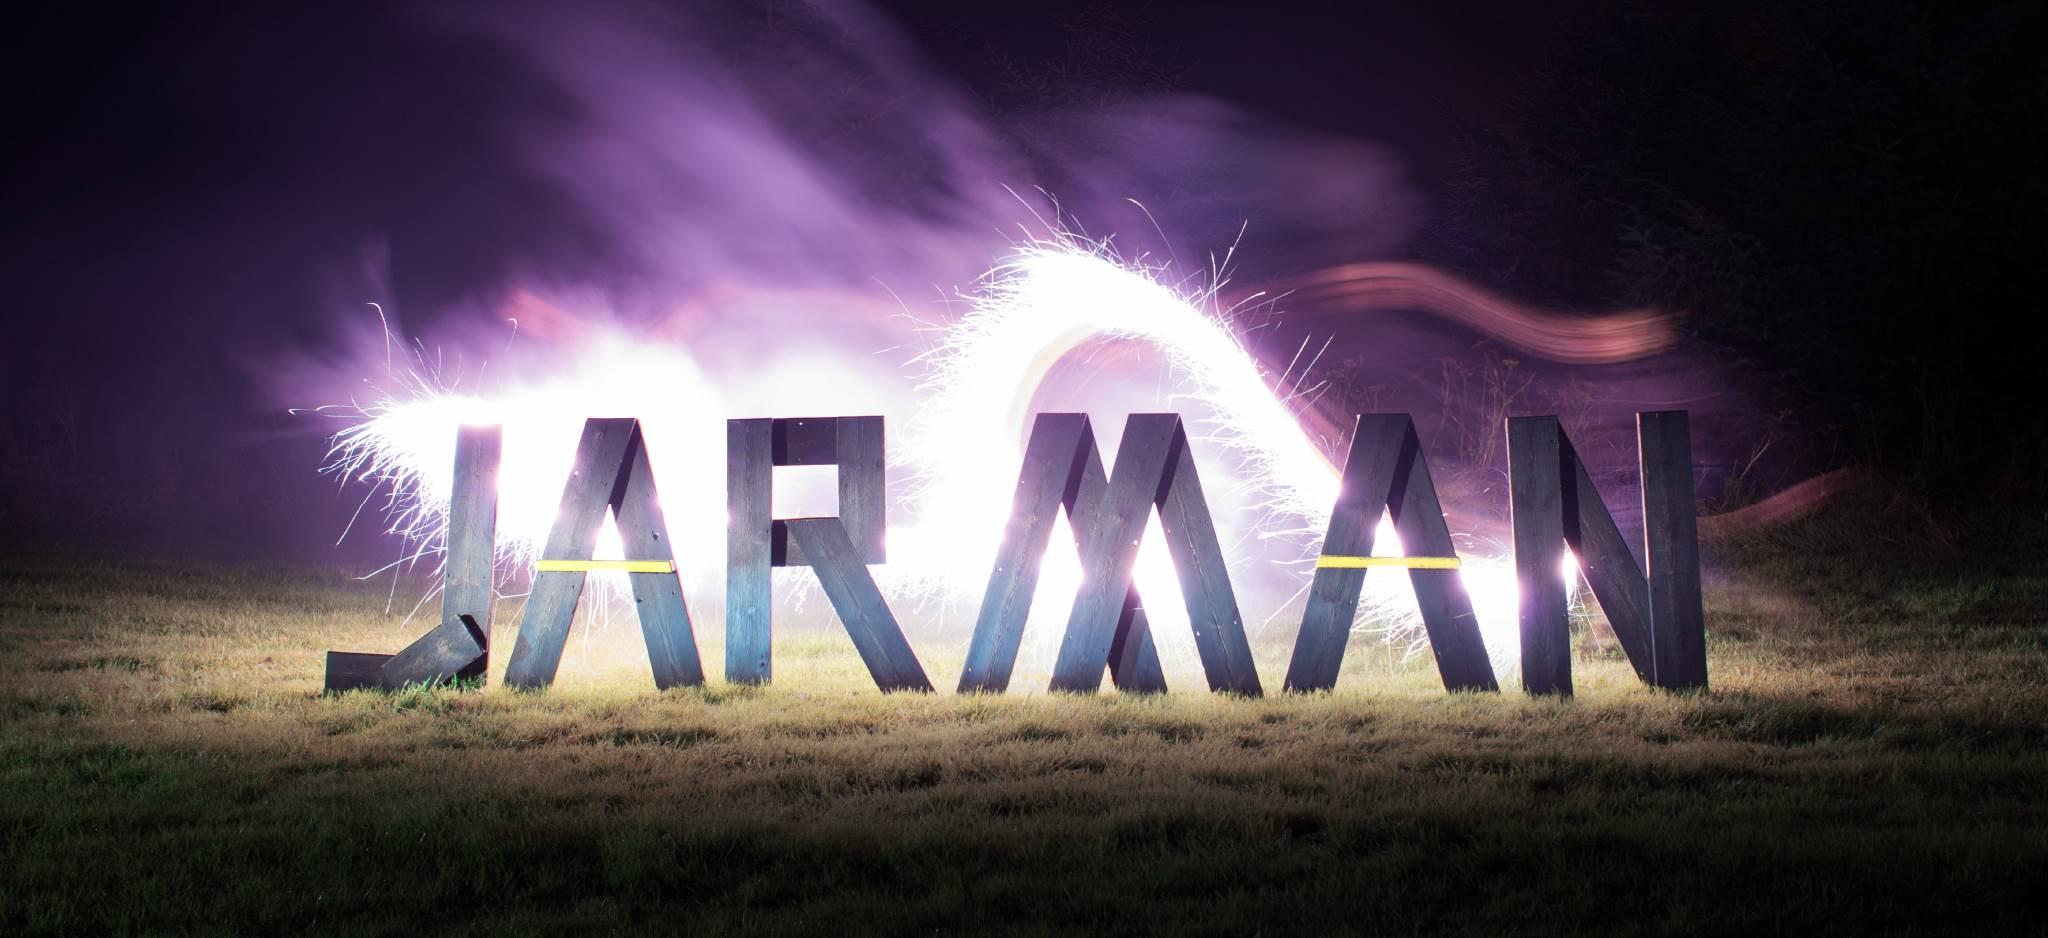 FLAMIN PRESENTS | Jarman Awards at Shenzhen MAF: Modern Nature